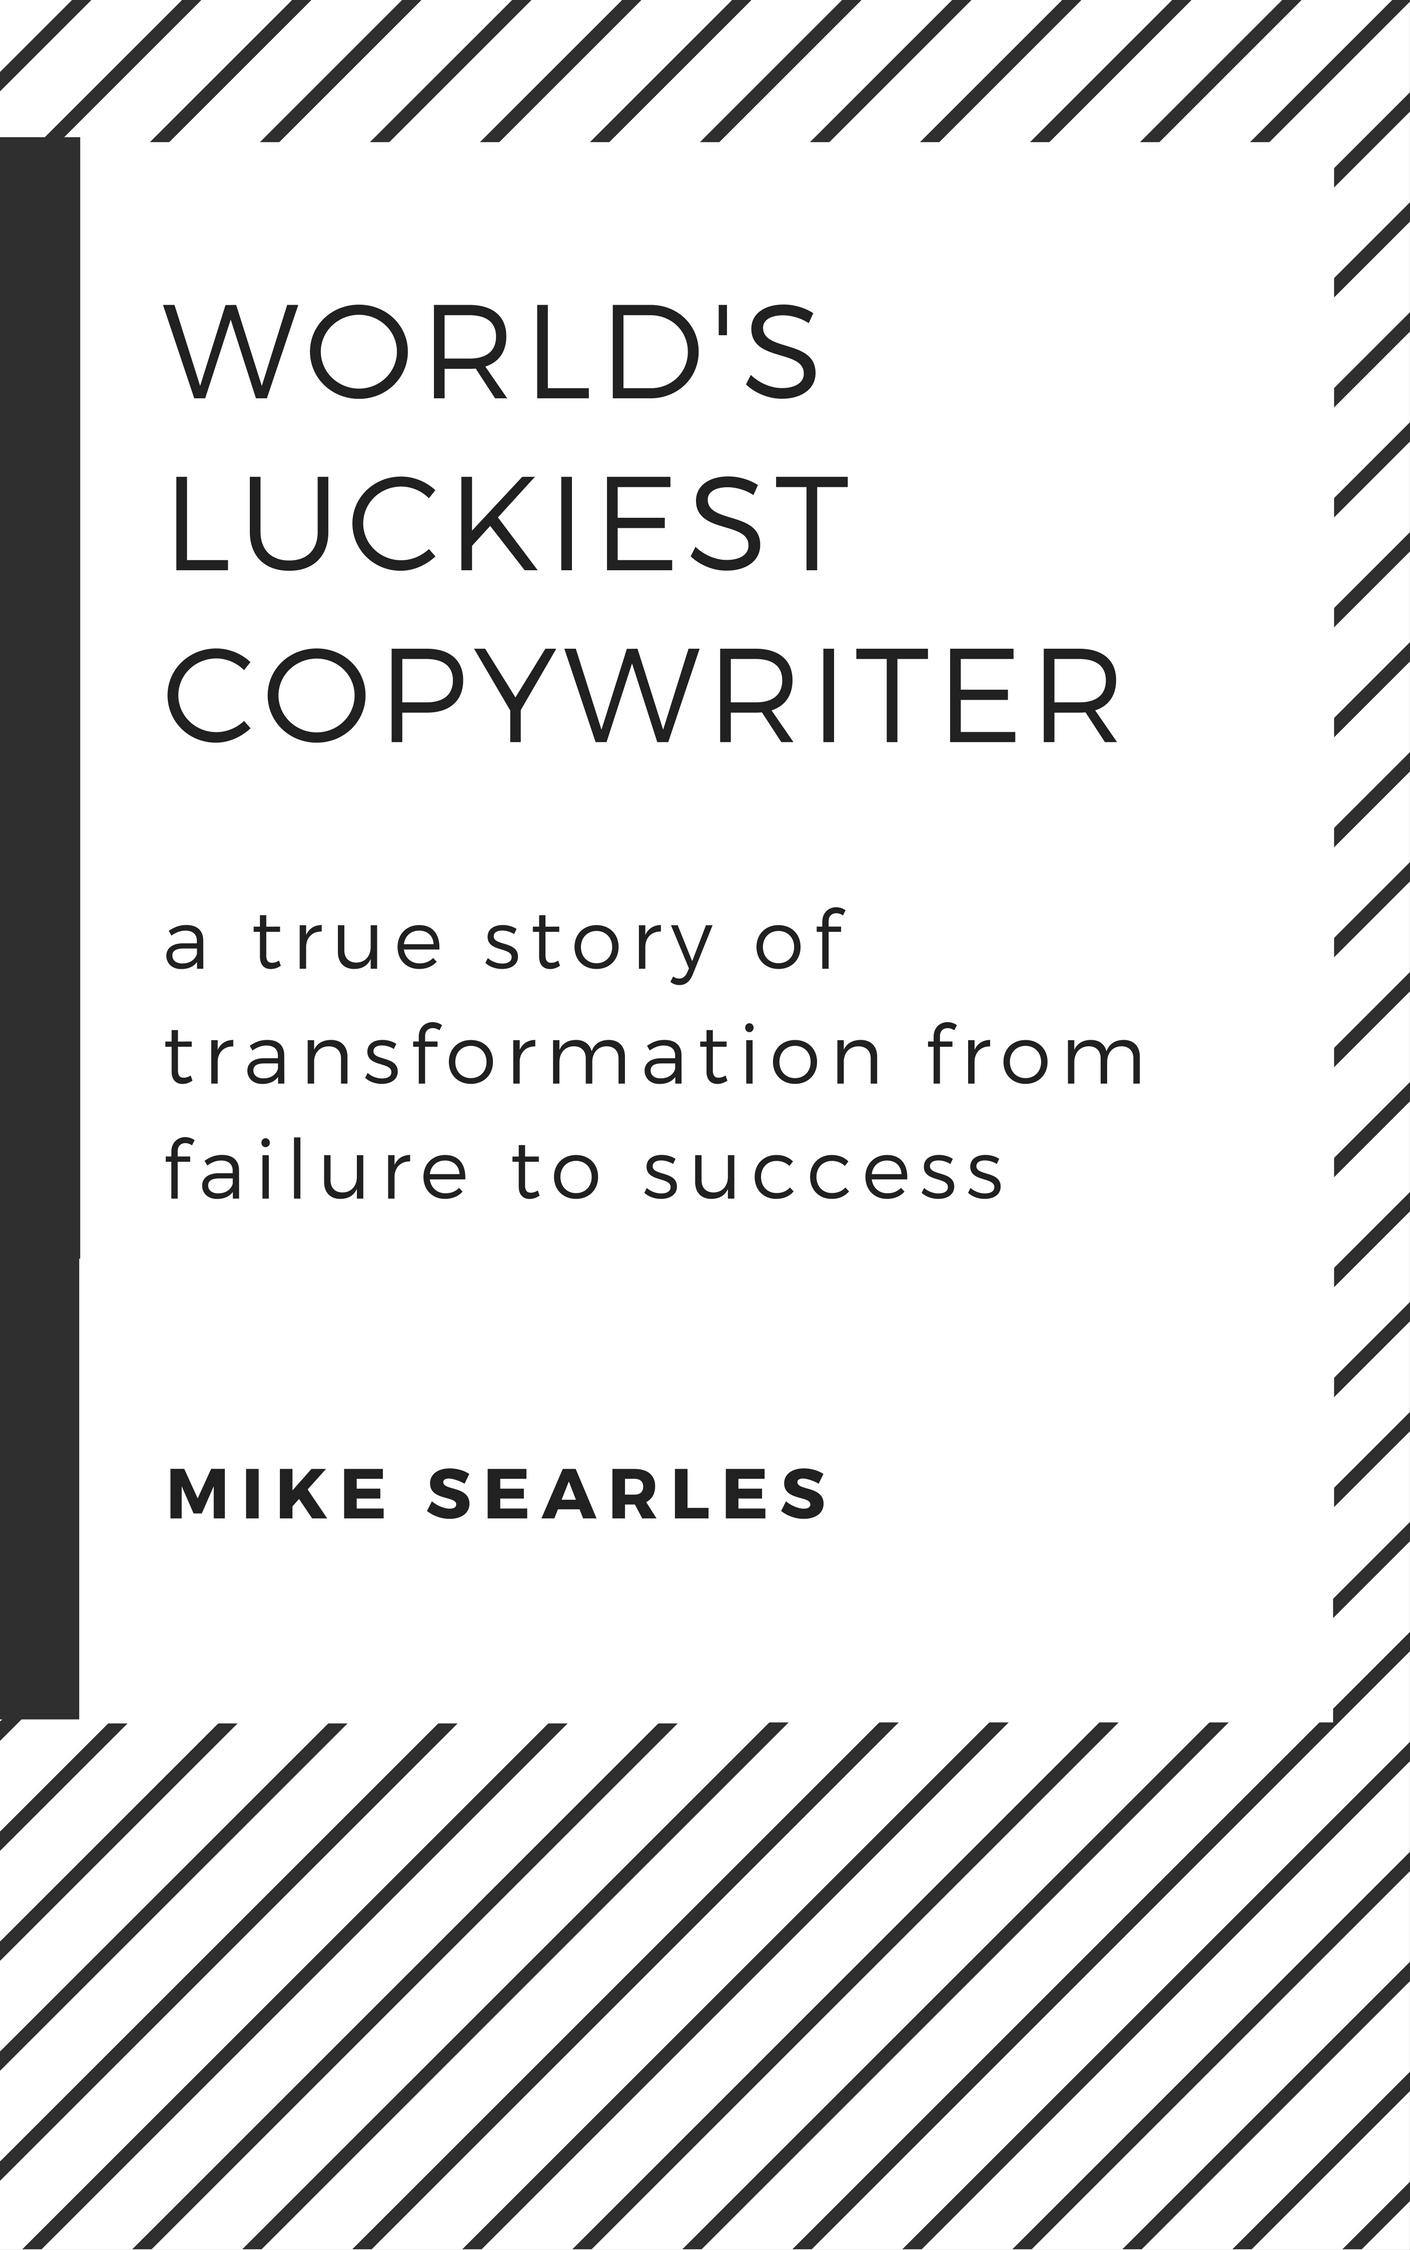 World's Luckiest Copywriter - Mike Searles